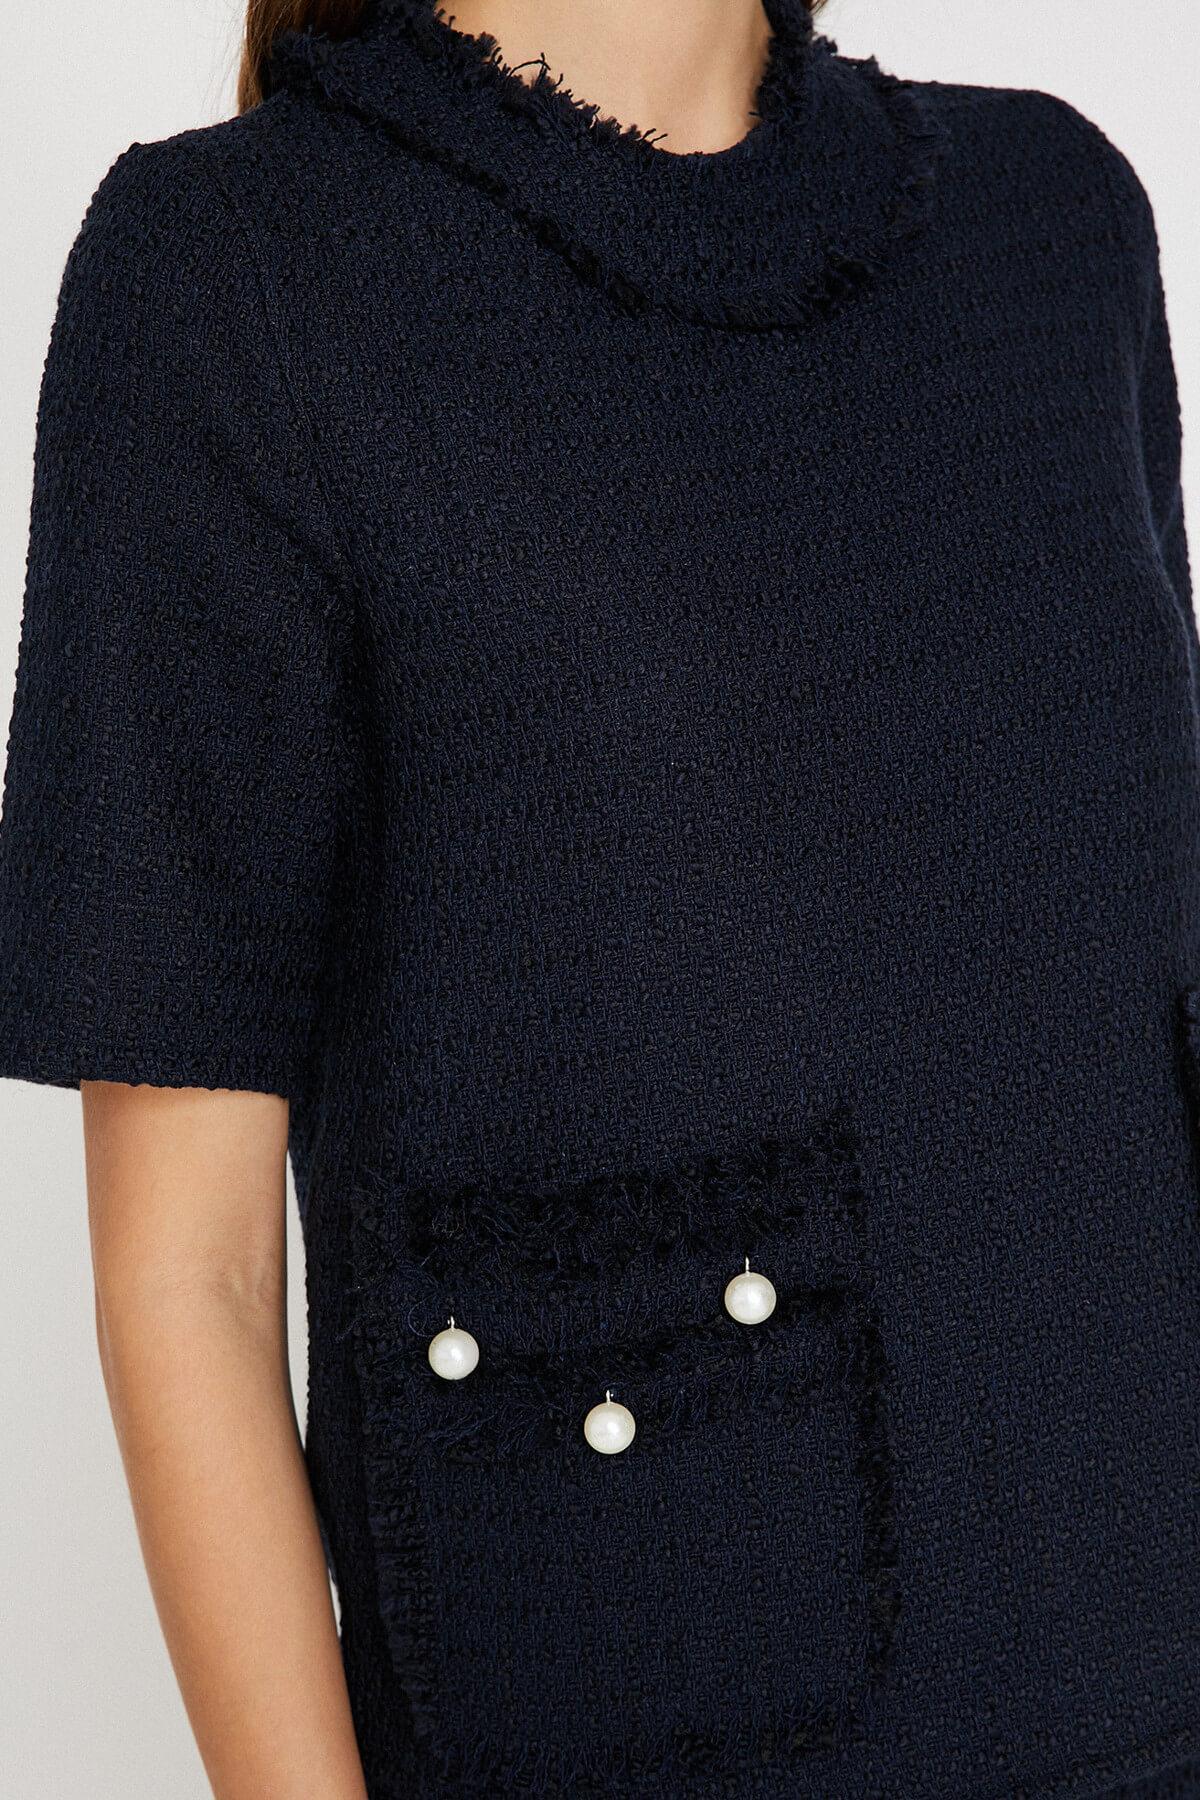 Koton para mujer azul marino xirnci detallada Bluz 9 KAK68875PW